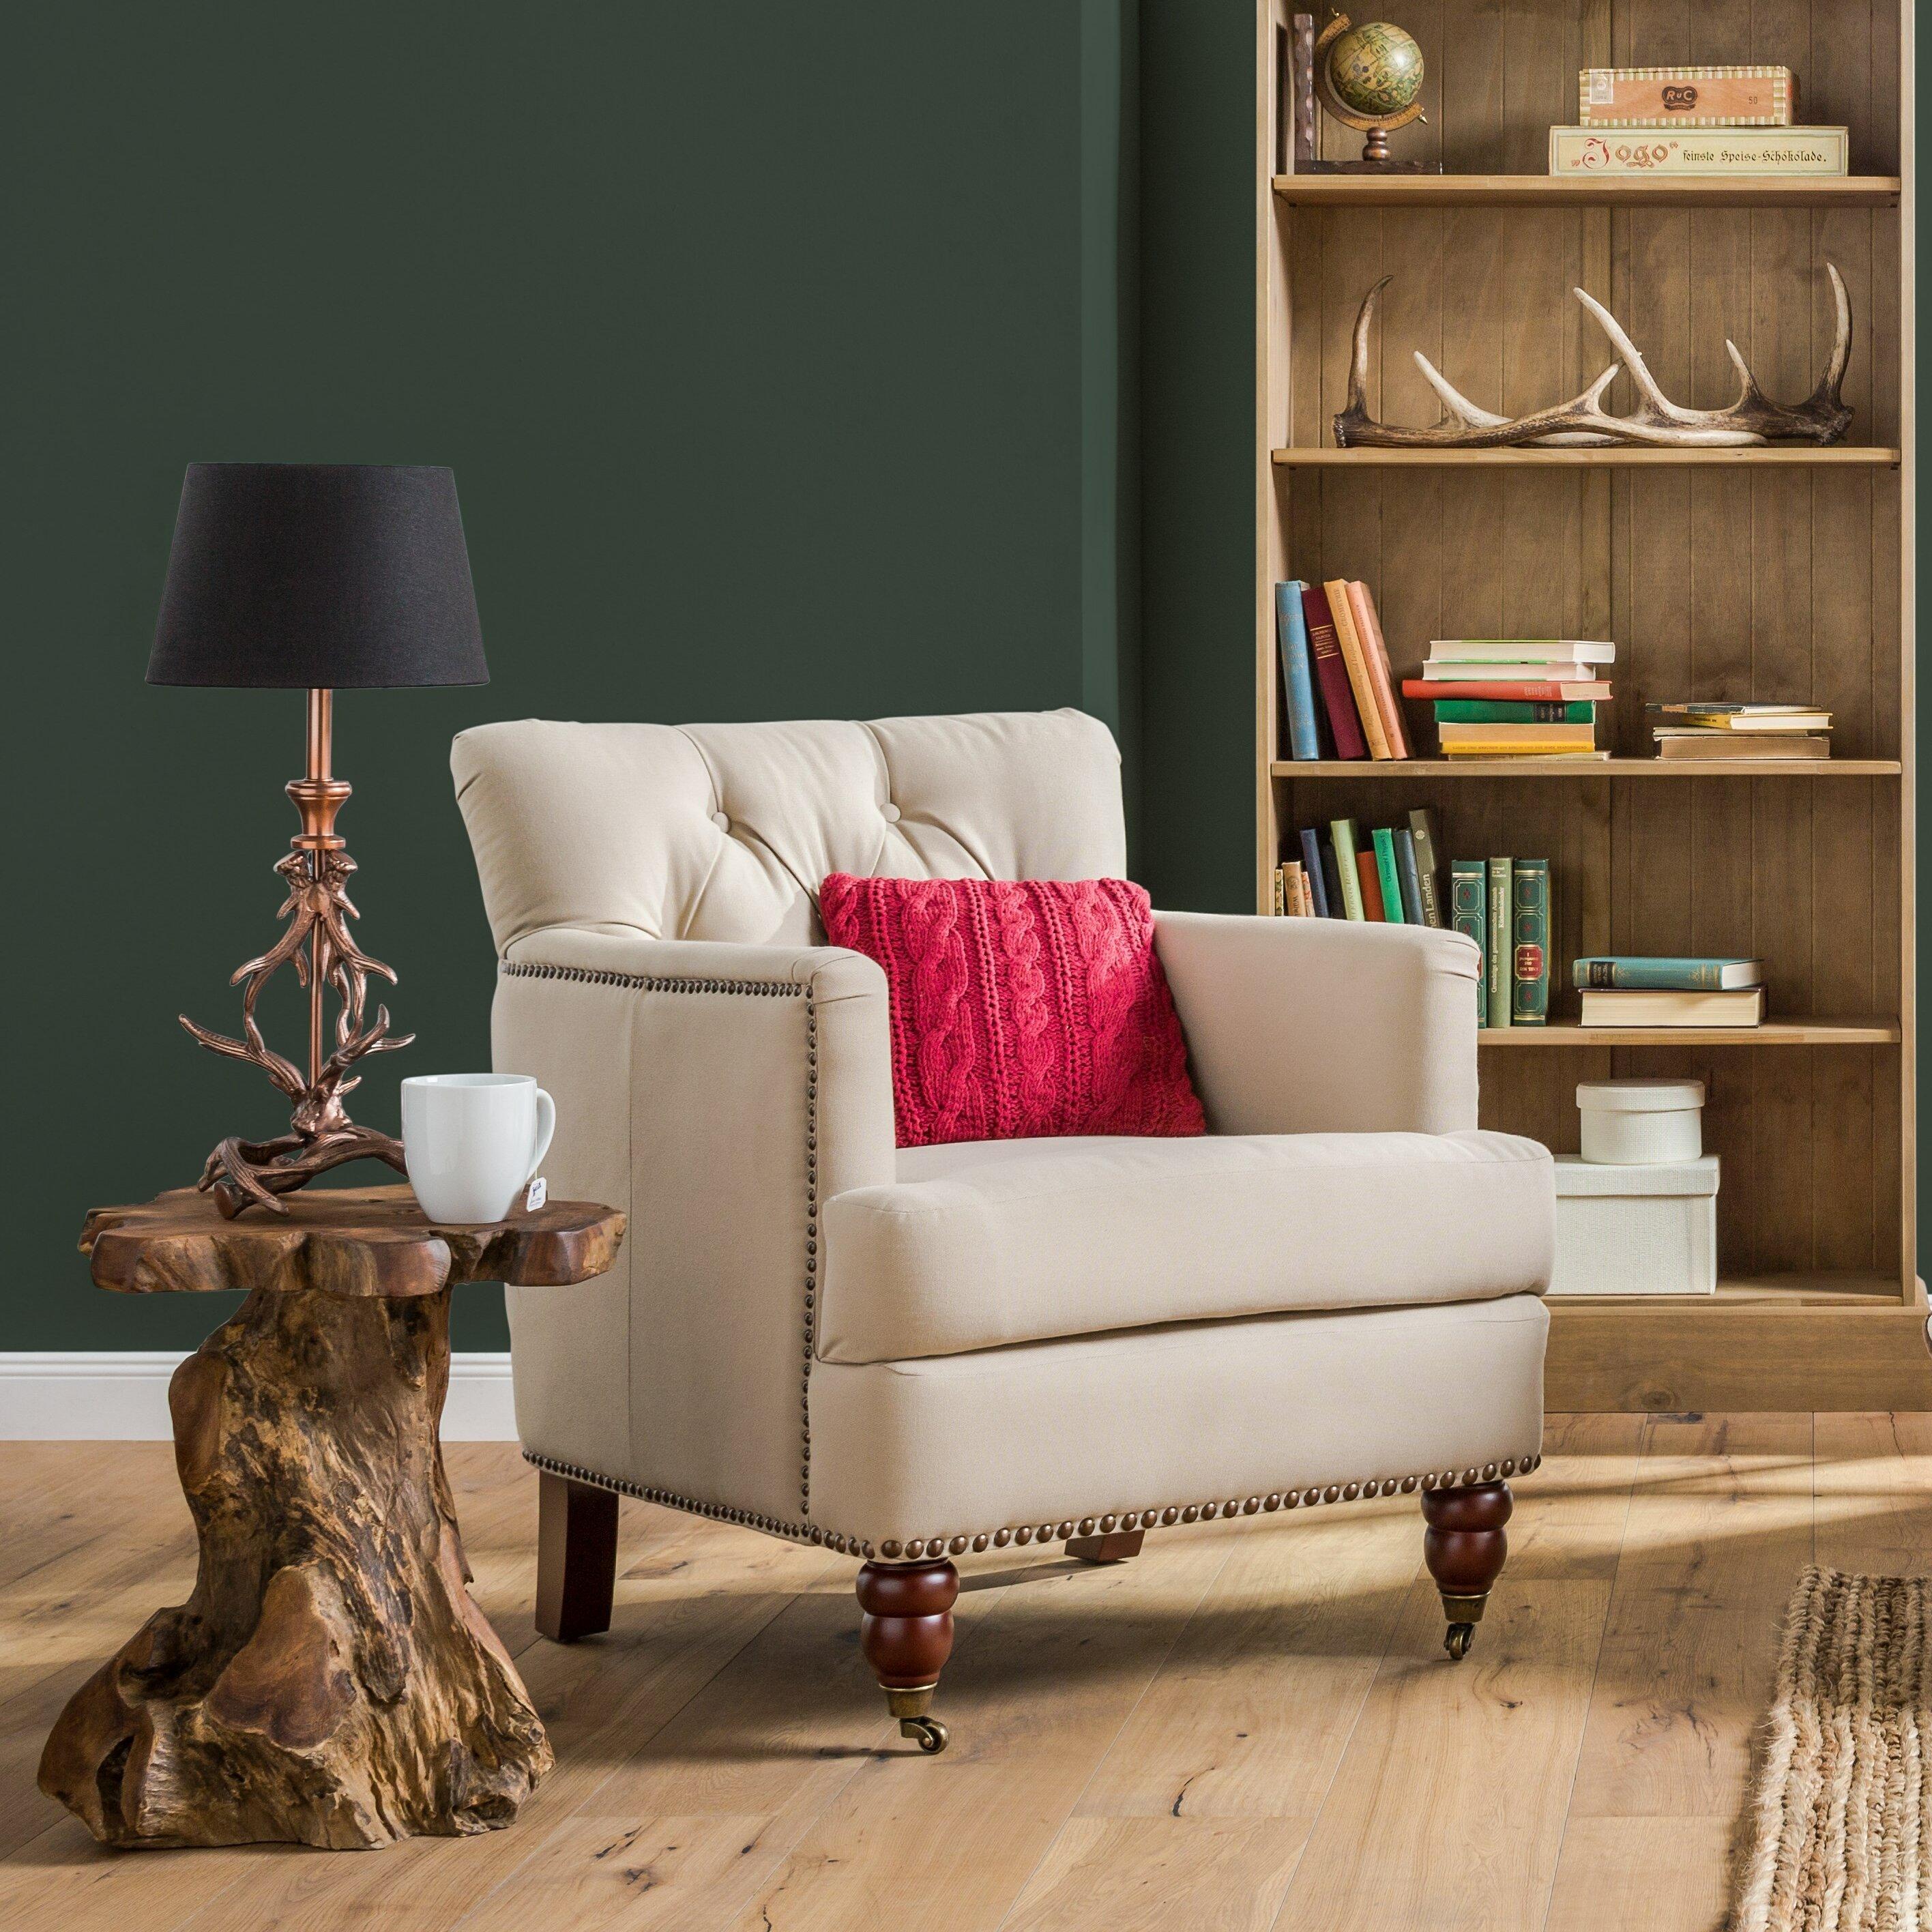 wayfair basics 25 7 cm trommel lampenschirm aus stoff. Black Bedroom Furniture Sets. Home Design Ideas